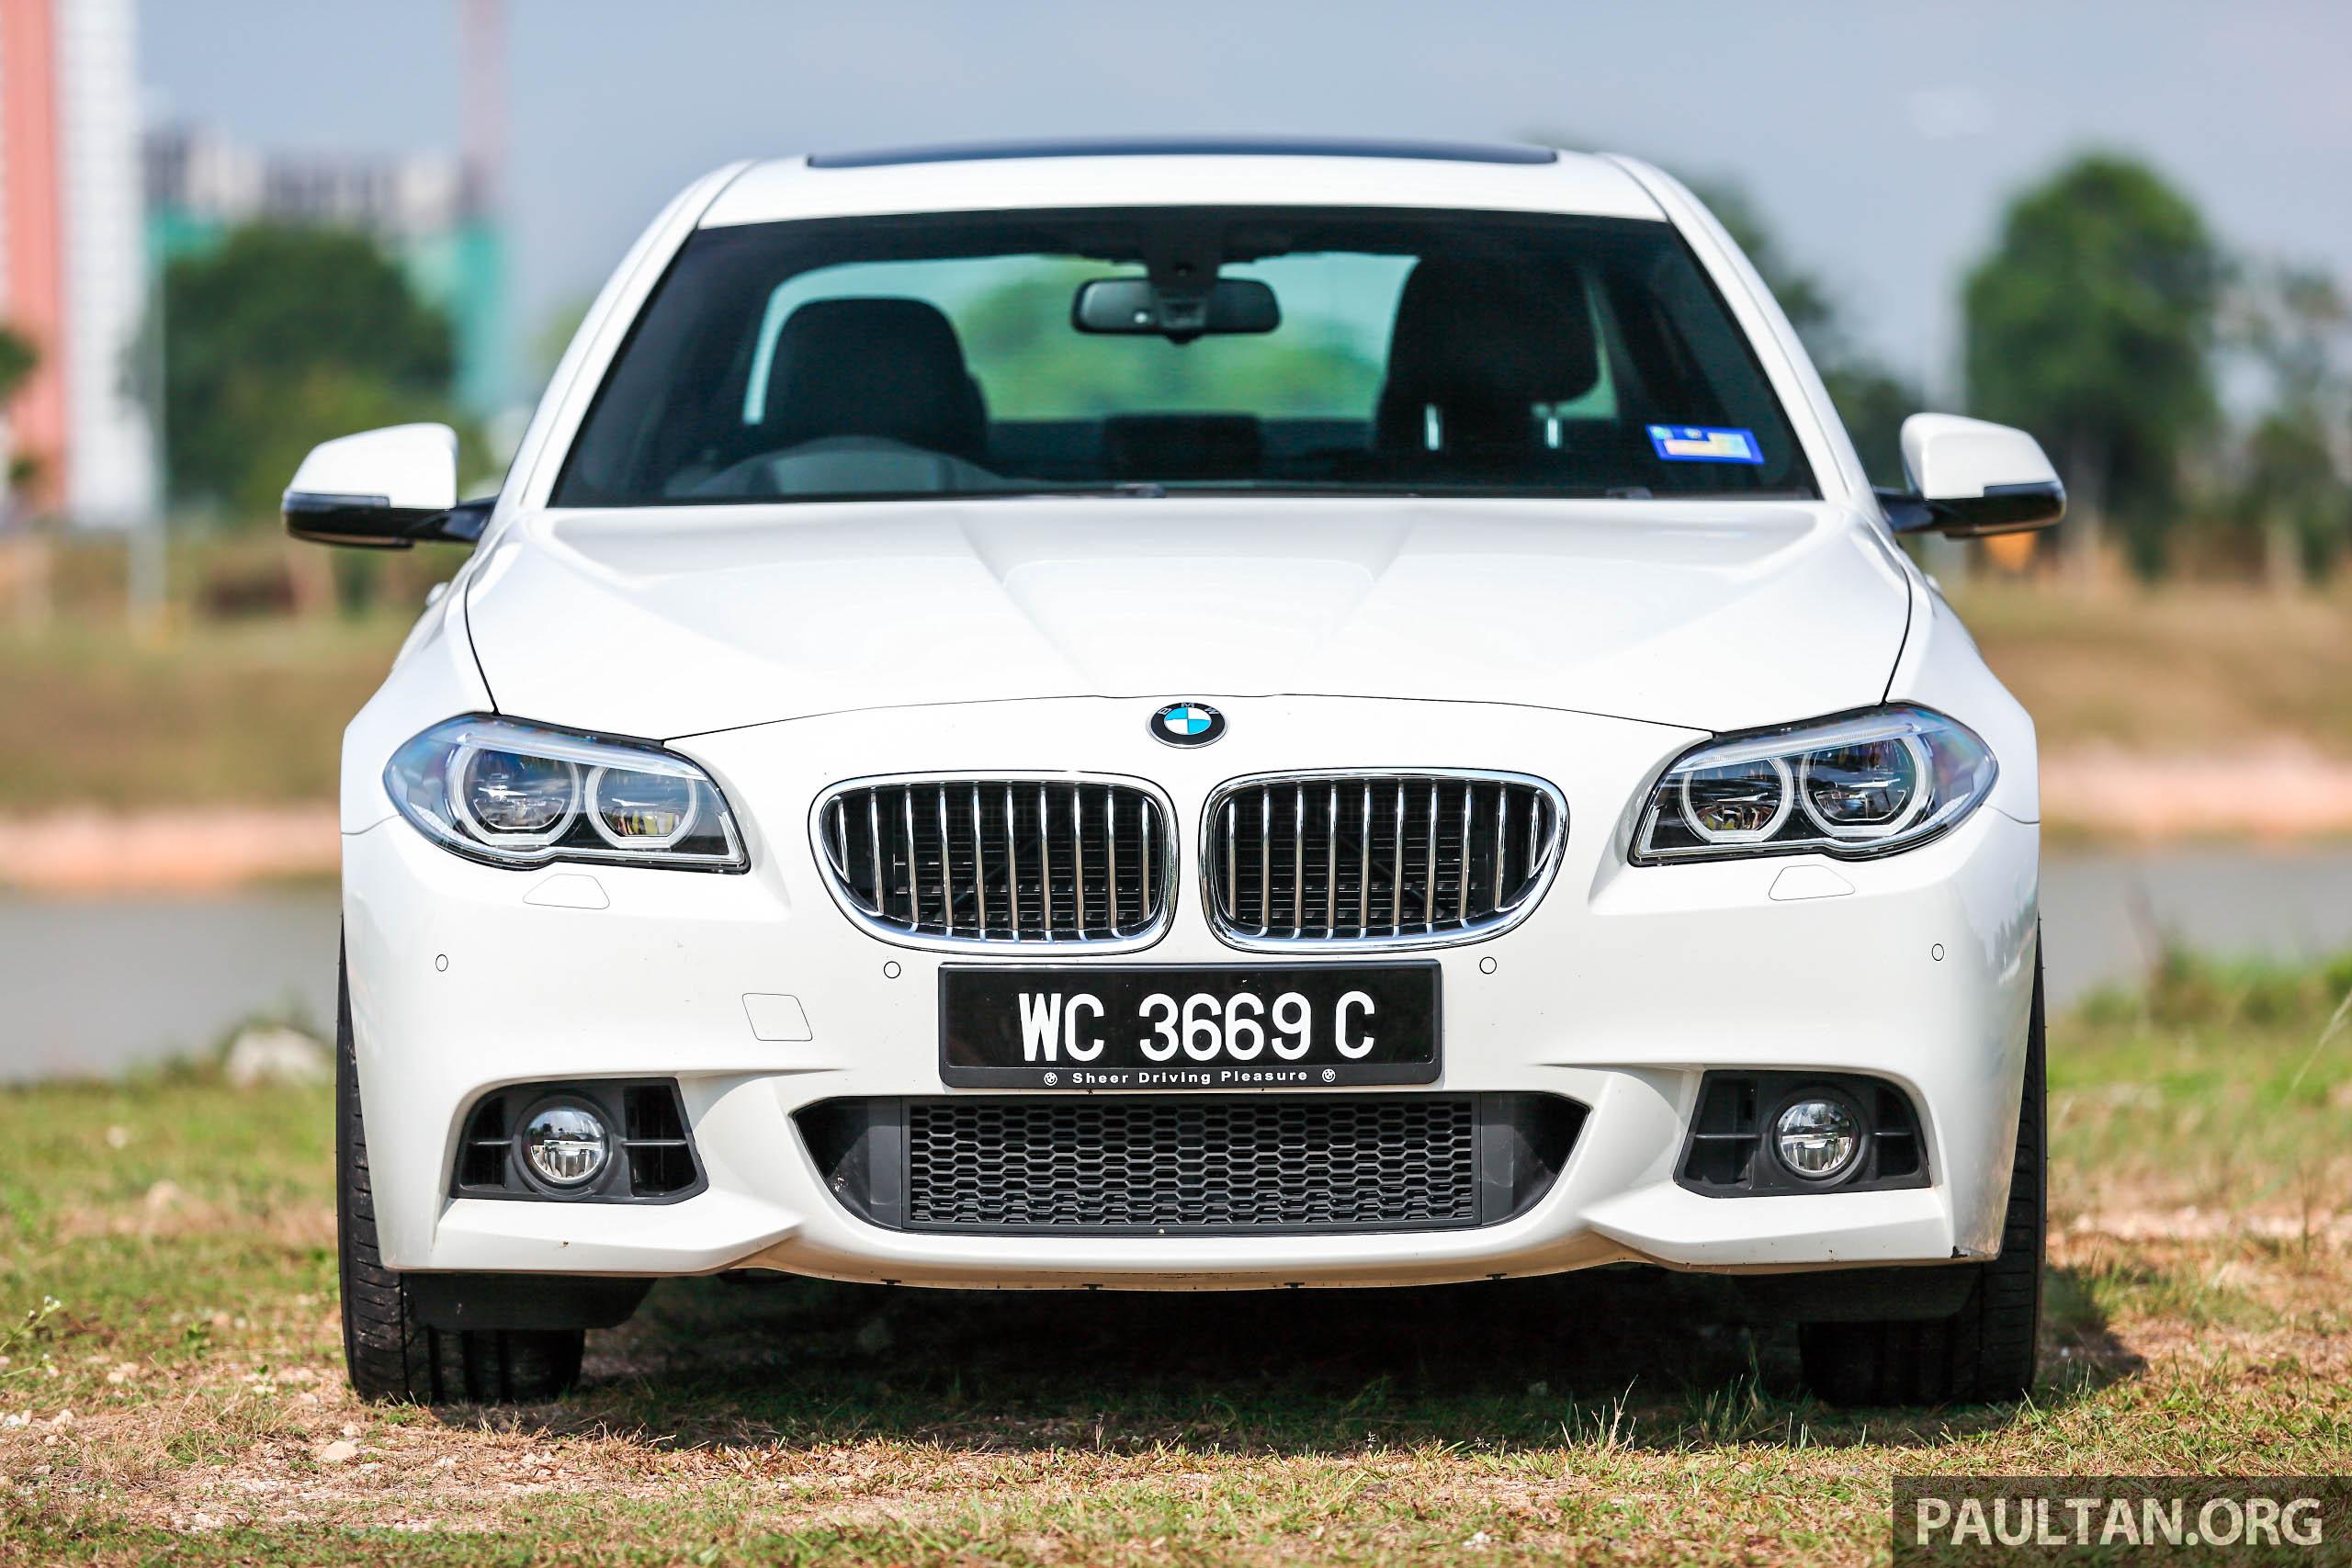 GALLERY BMW I M Sport Now RMk EEV Price Image - 528i bmw price